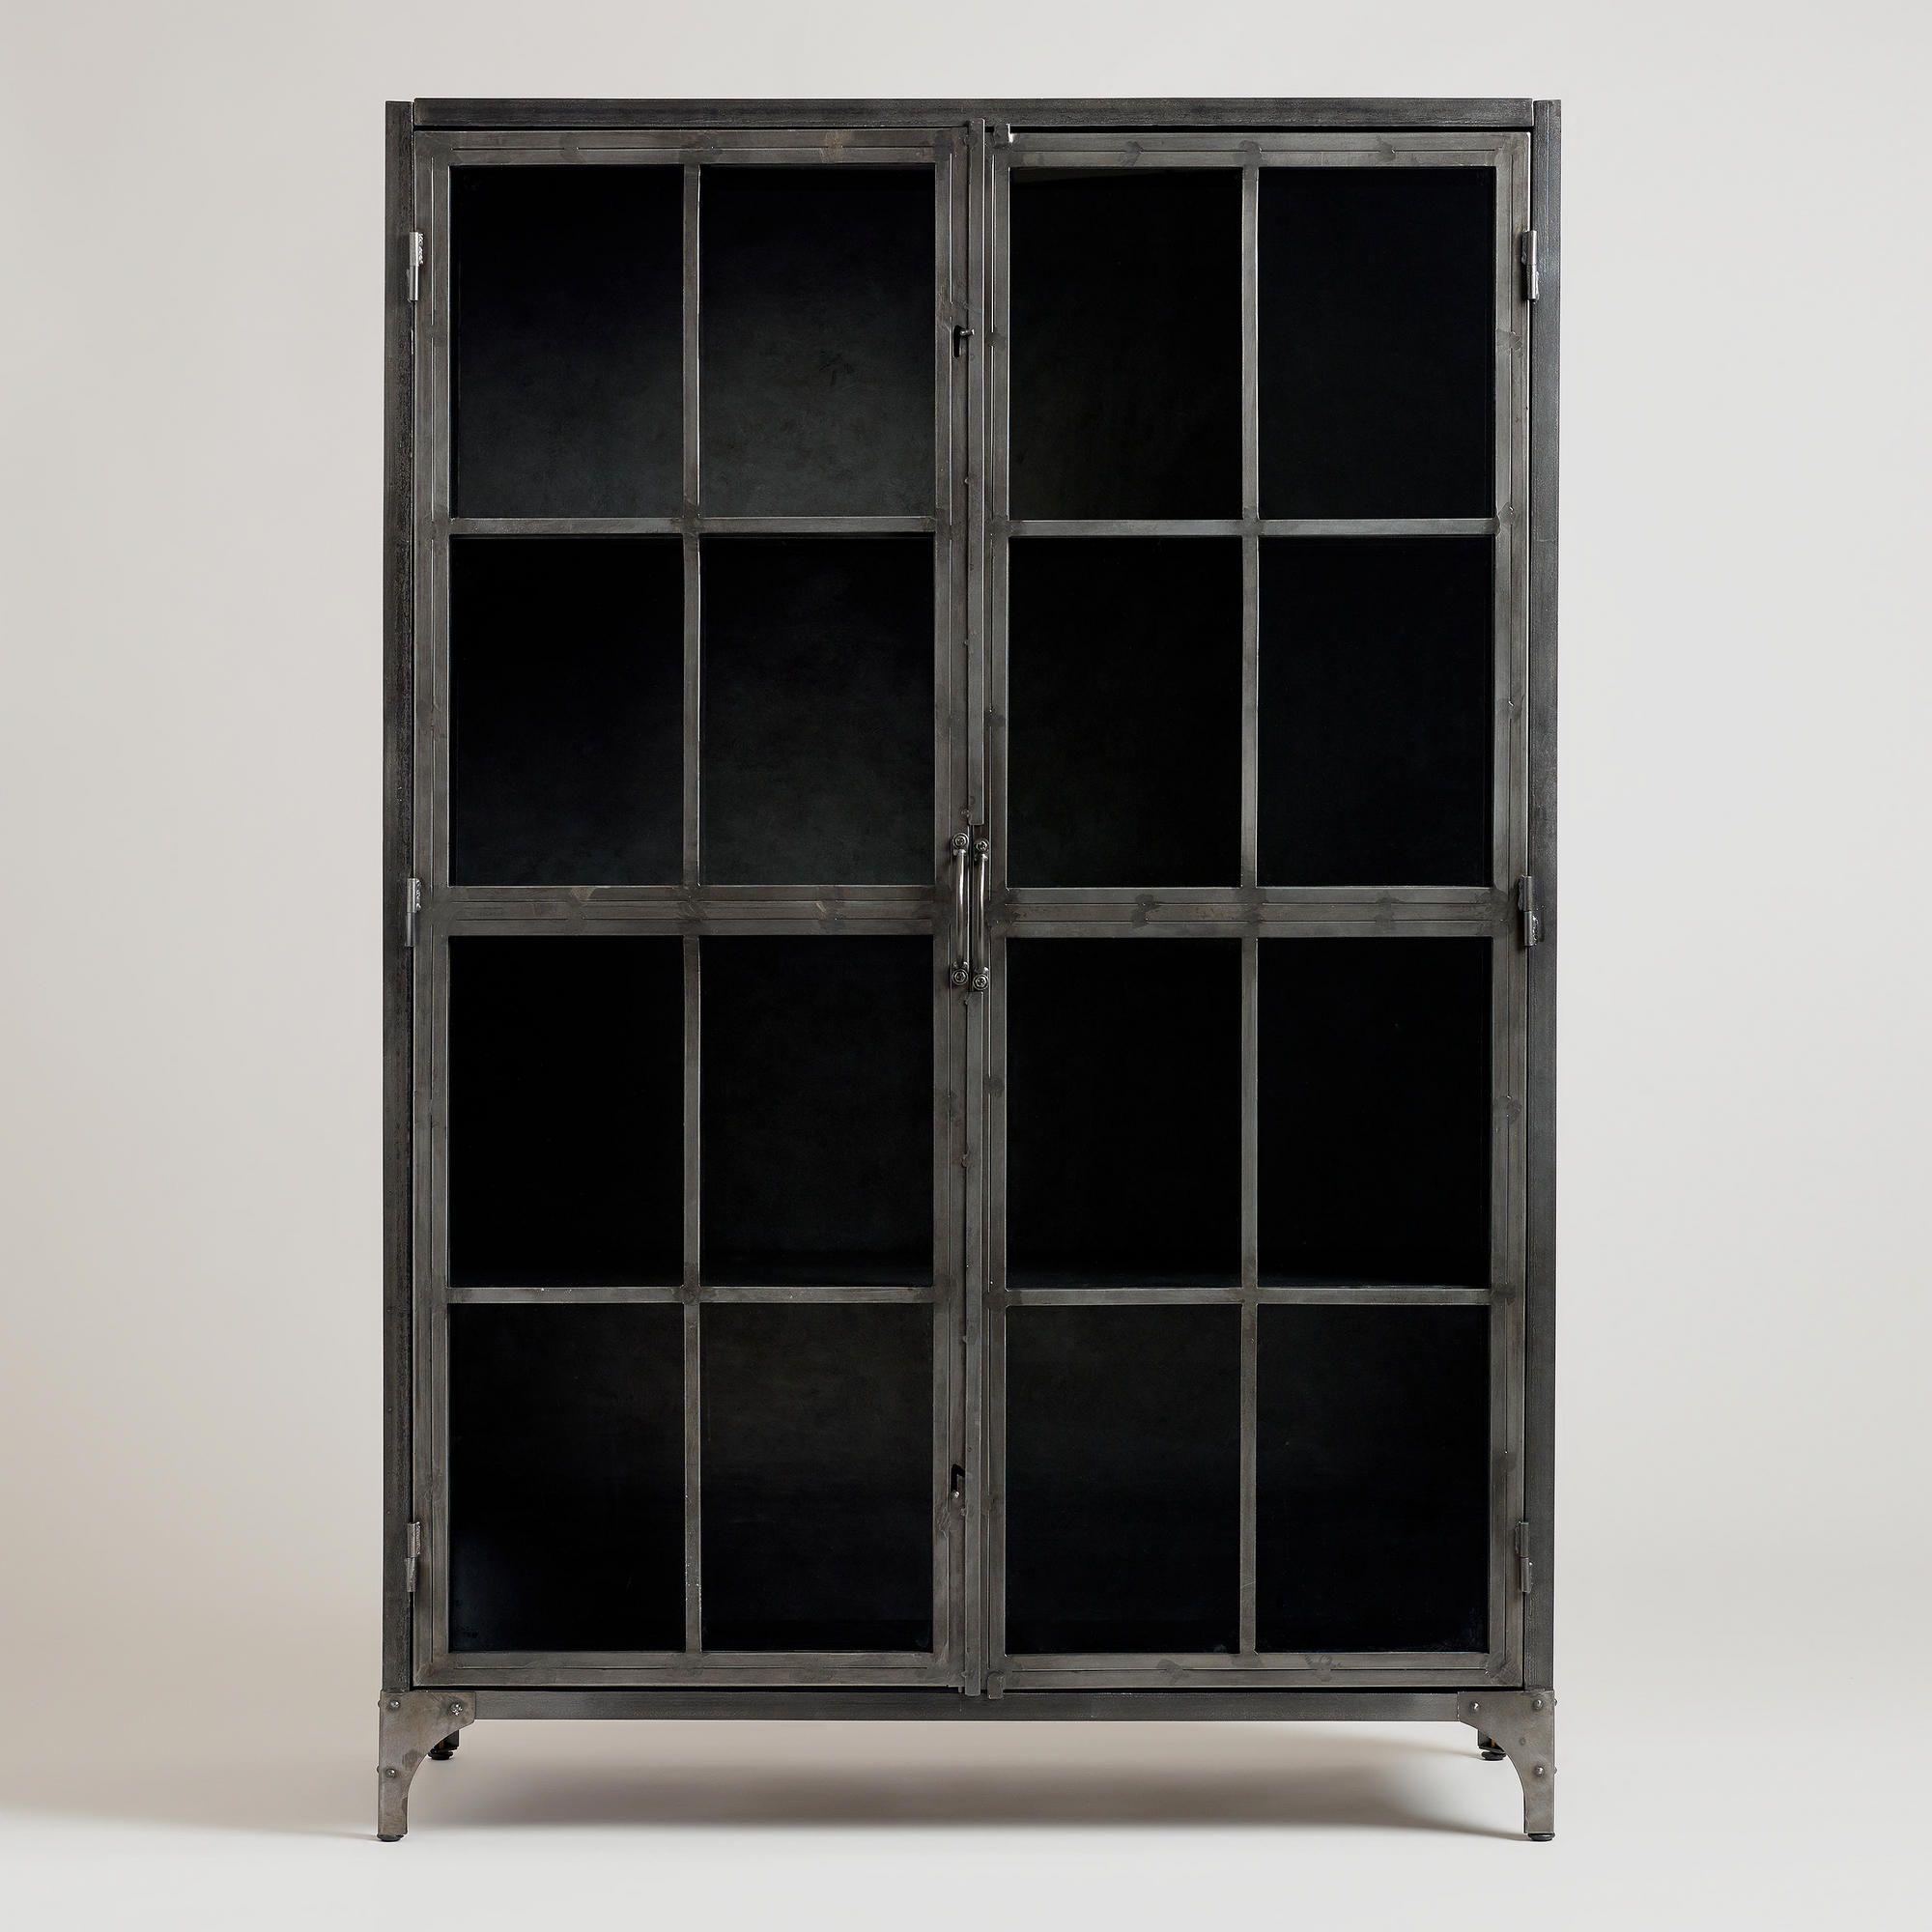 Cost Plus World Market Metal Display Cabinet Sku 484139 Http Www